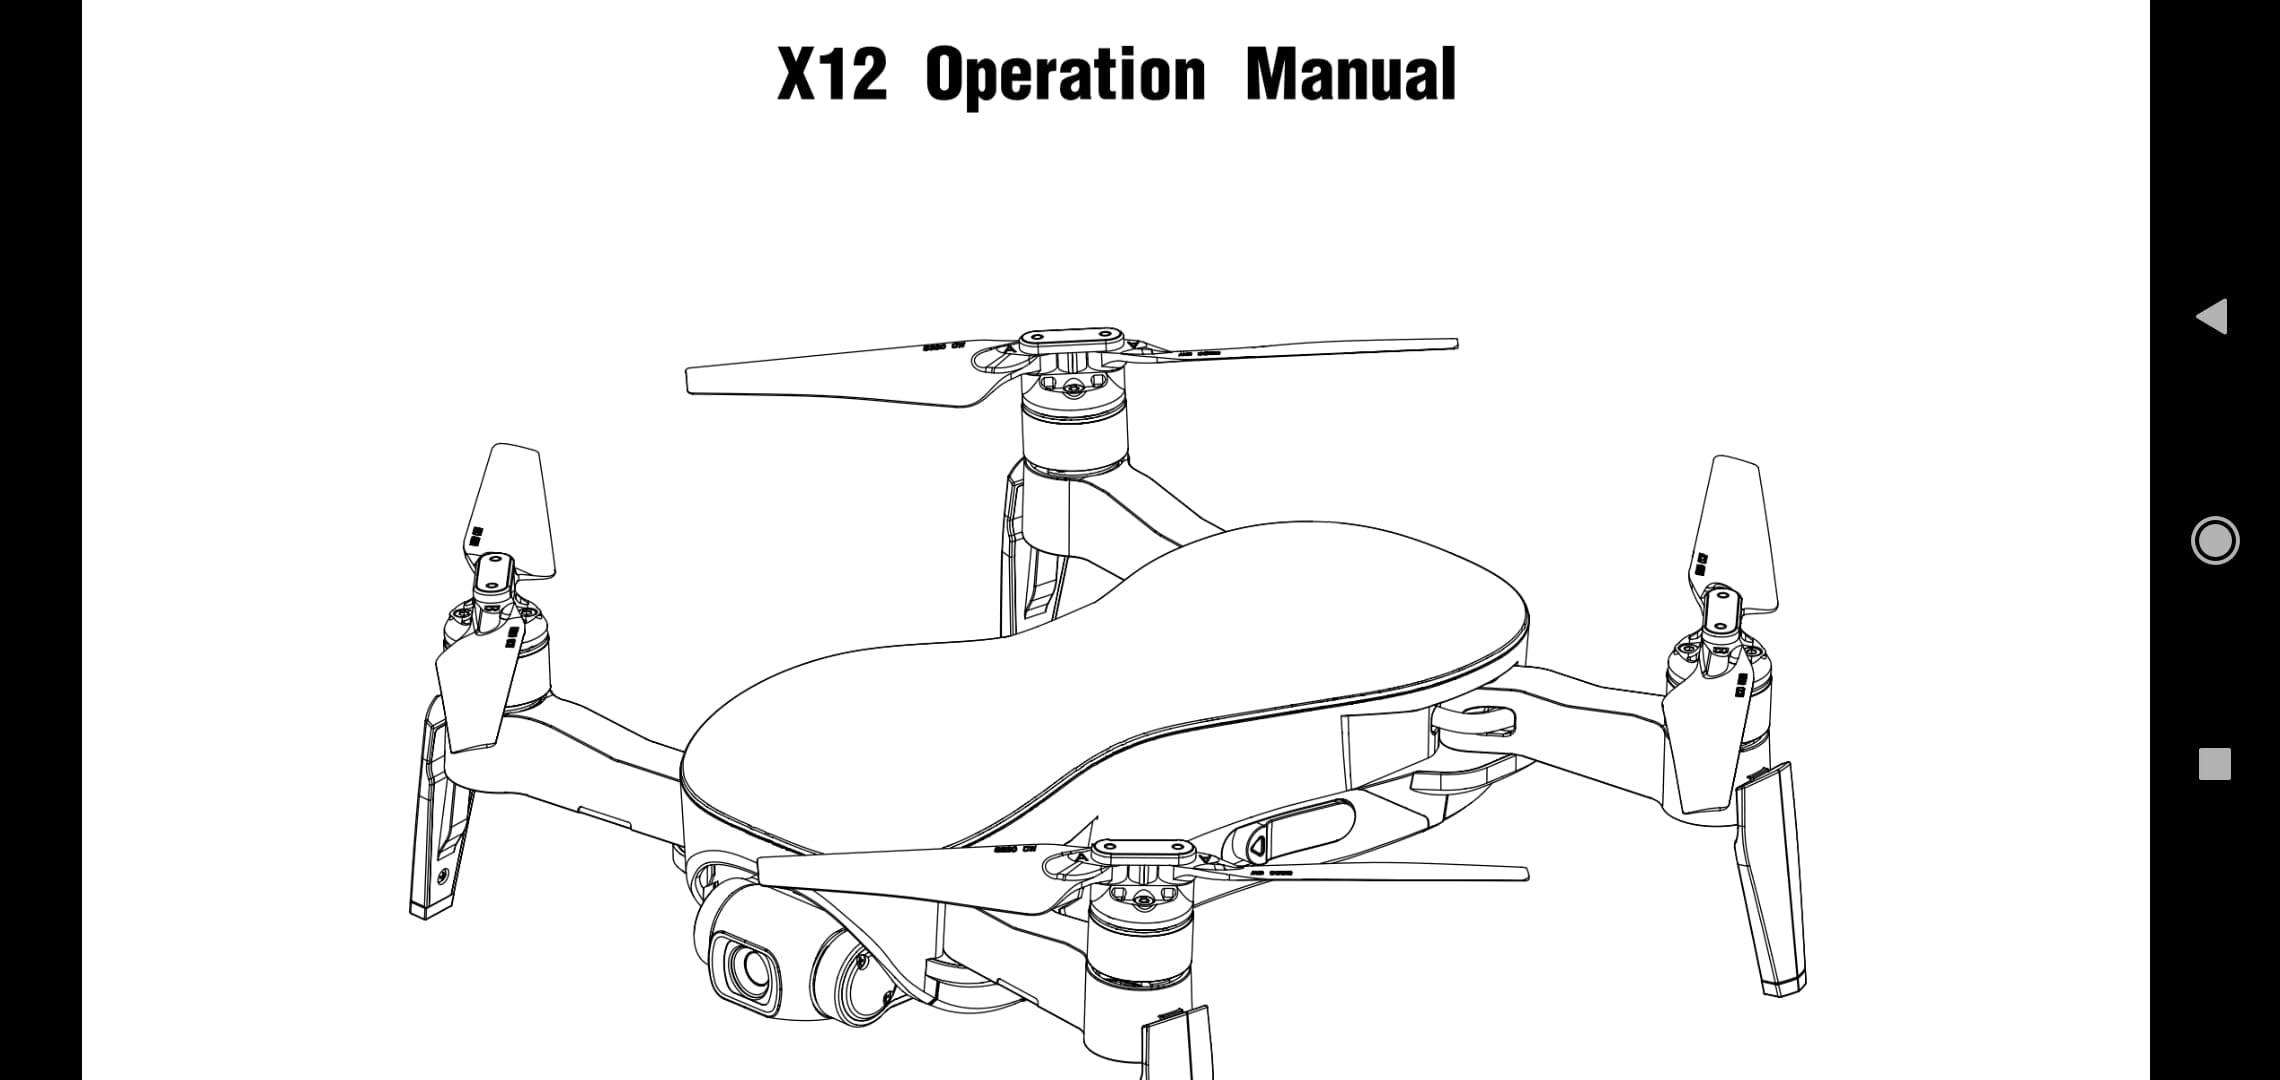 JJRC X12 User Manual download